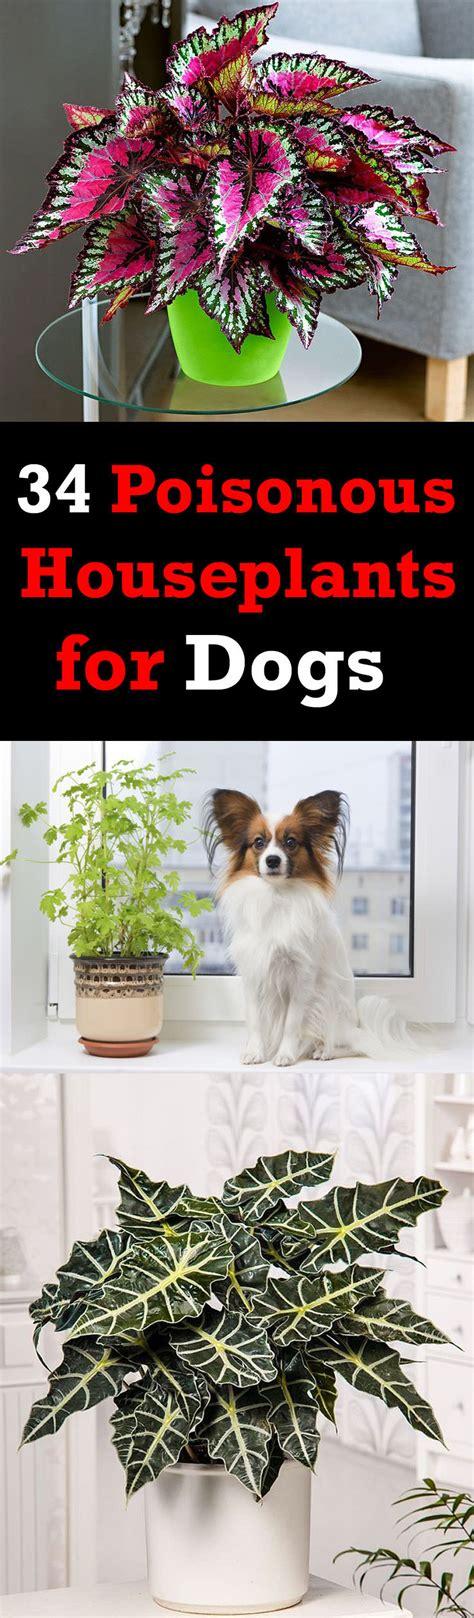 poisonous houseplants  dogs plants toxic  dogs